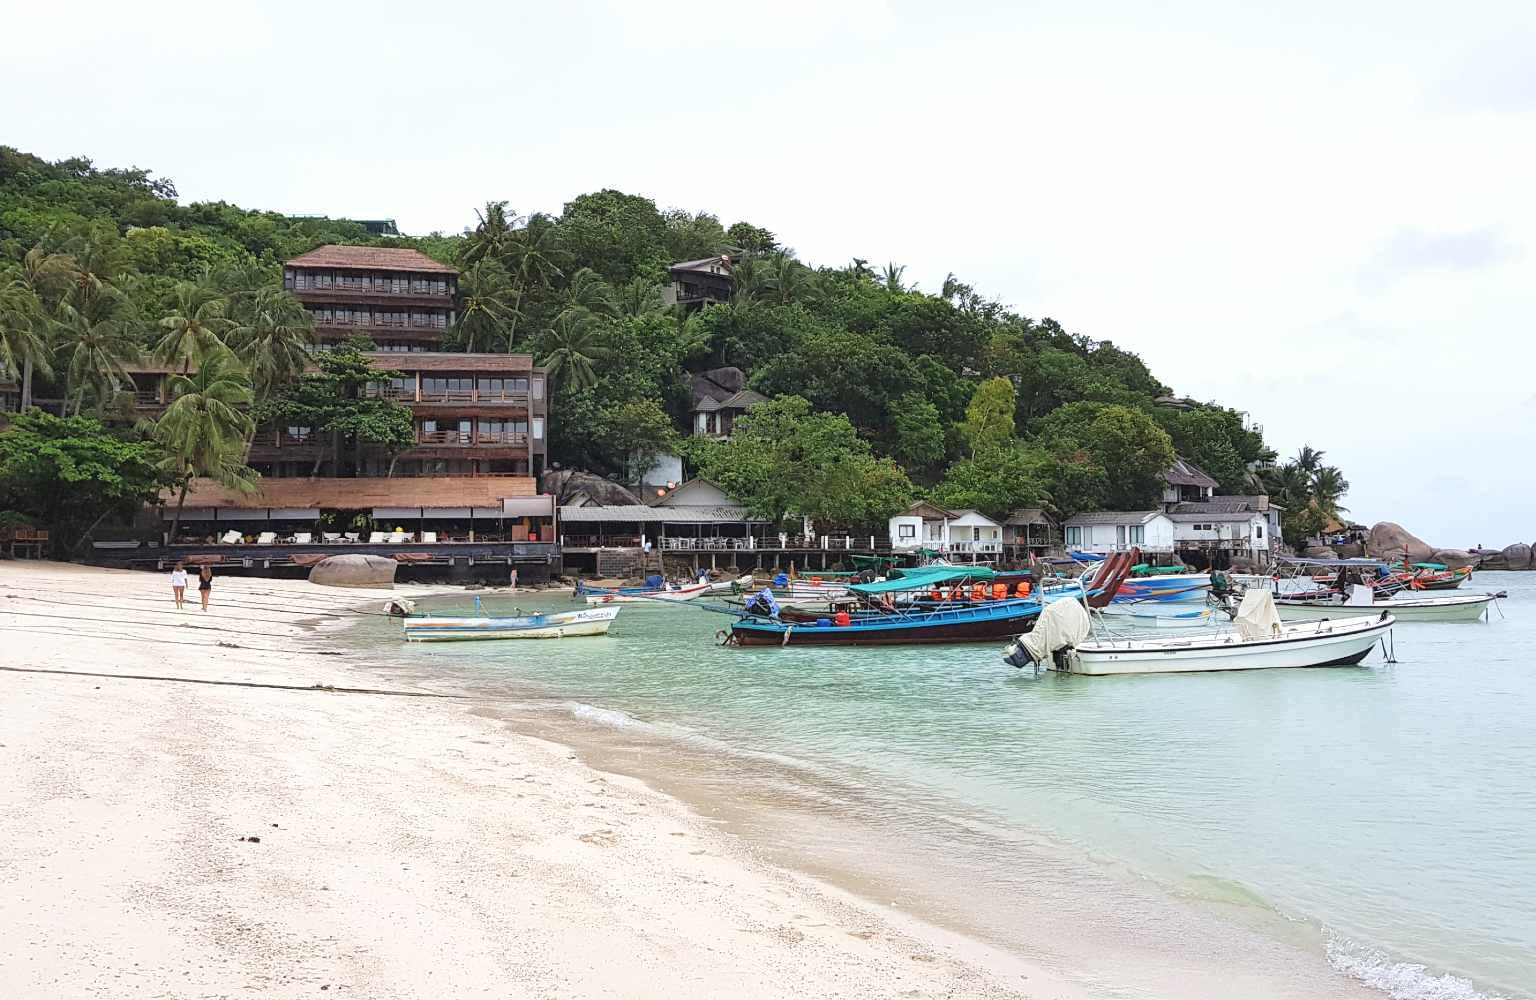 The beach of Shark Bay (Thian Og Bay) on Koh Tao with all resorts